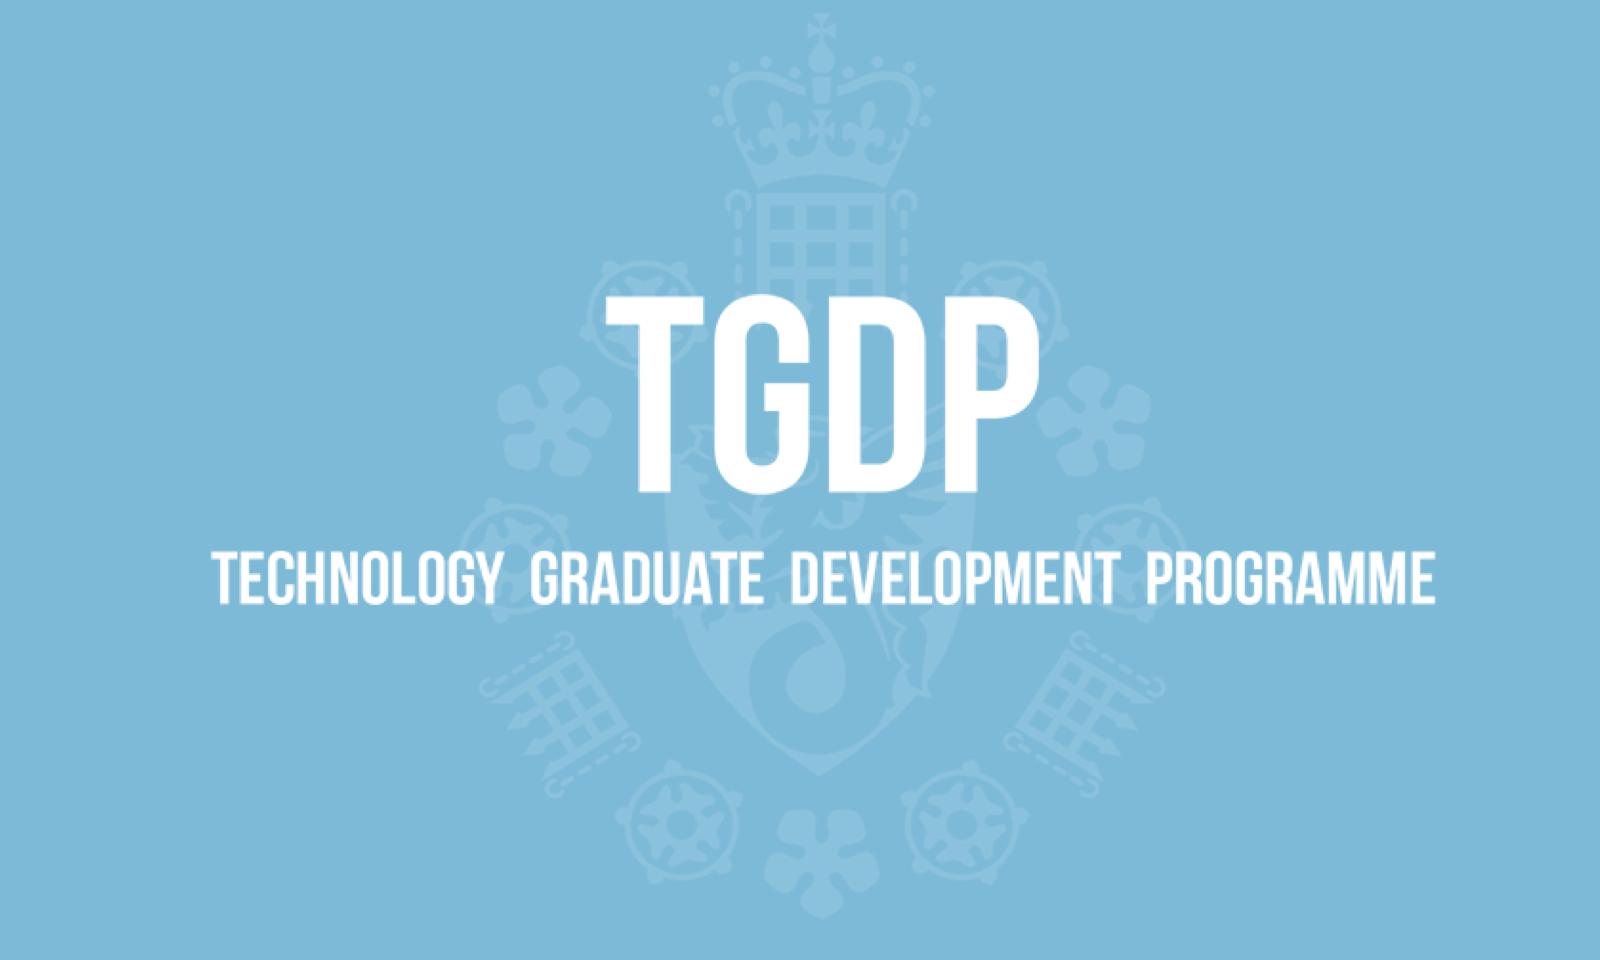 TGDP- Technology Graduate Development Programme